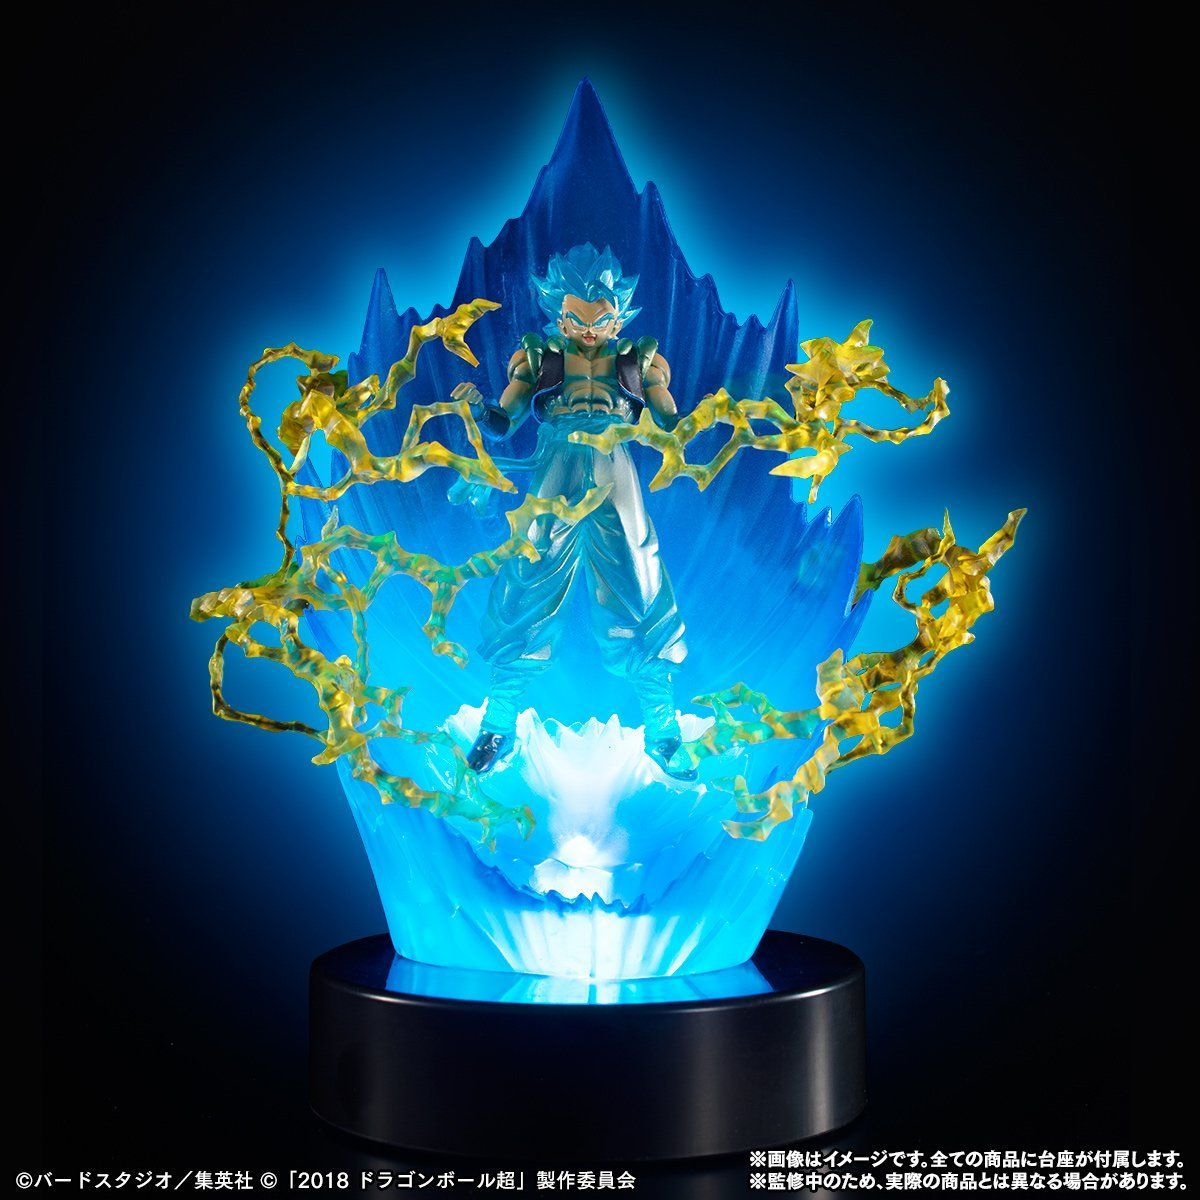 HGシリーズ『映画ドラゴンボール超 悟空!ベジータ!フュージョンセット』全8種-002